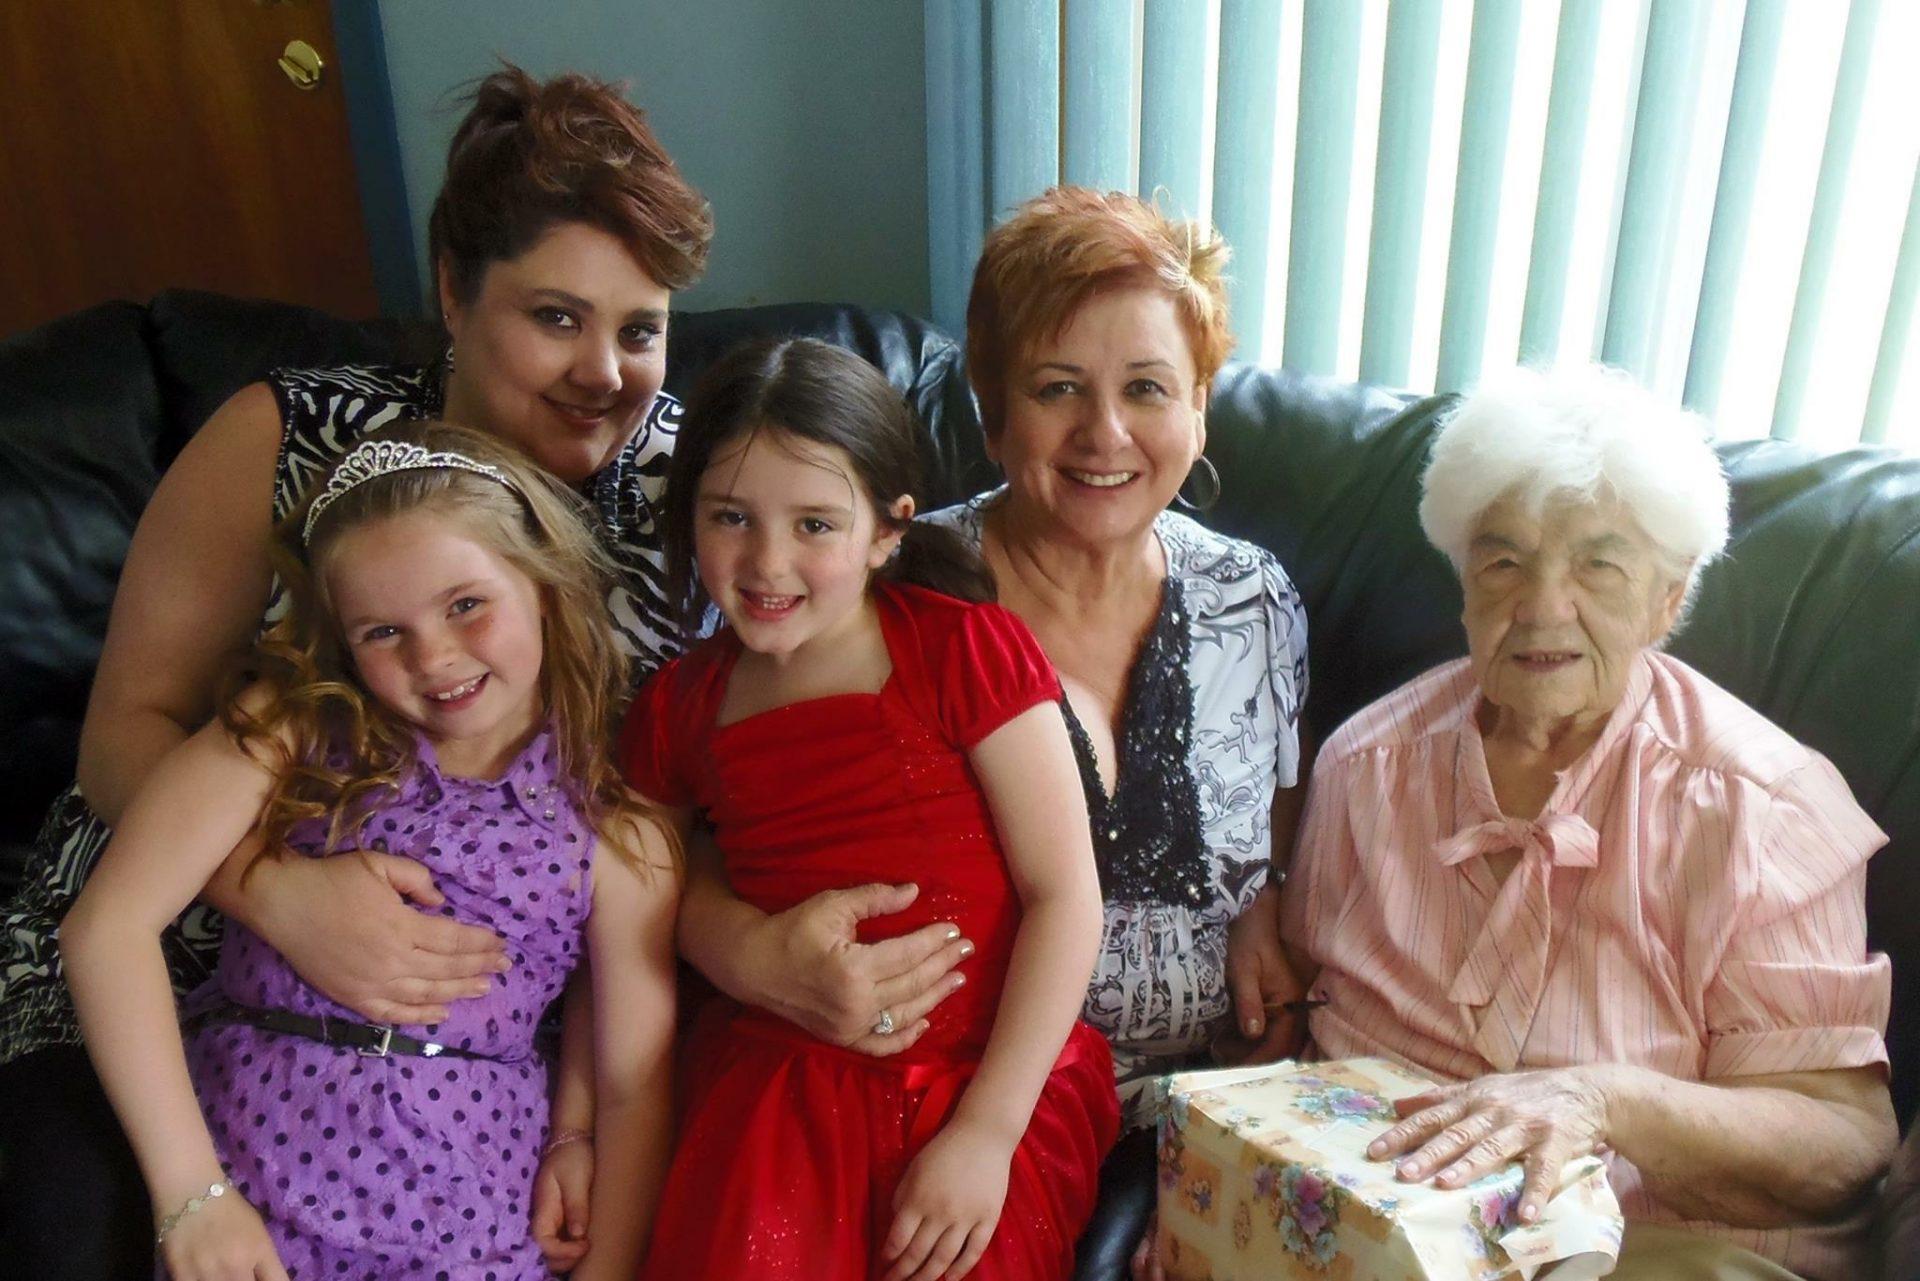 Colleen, Peggy, Grandma, Kelli, & Allie